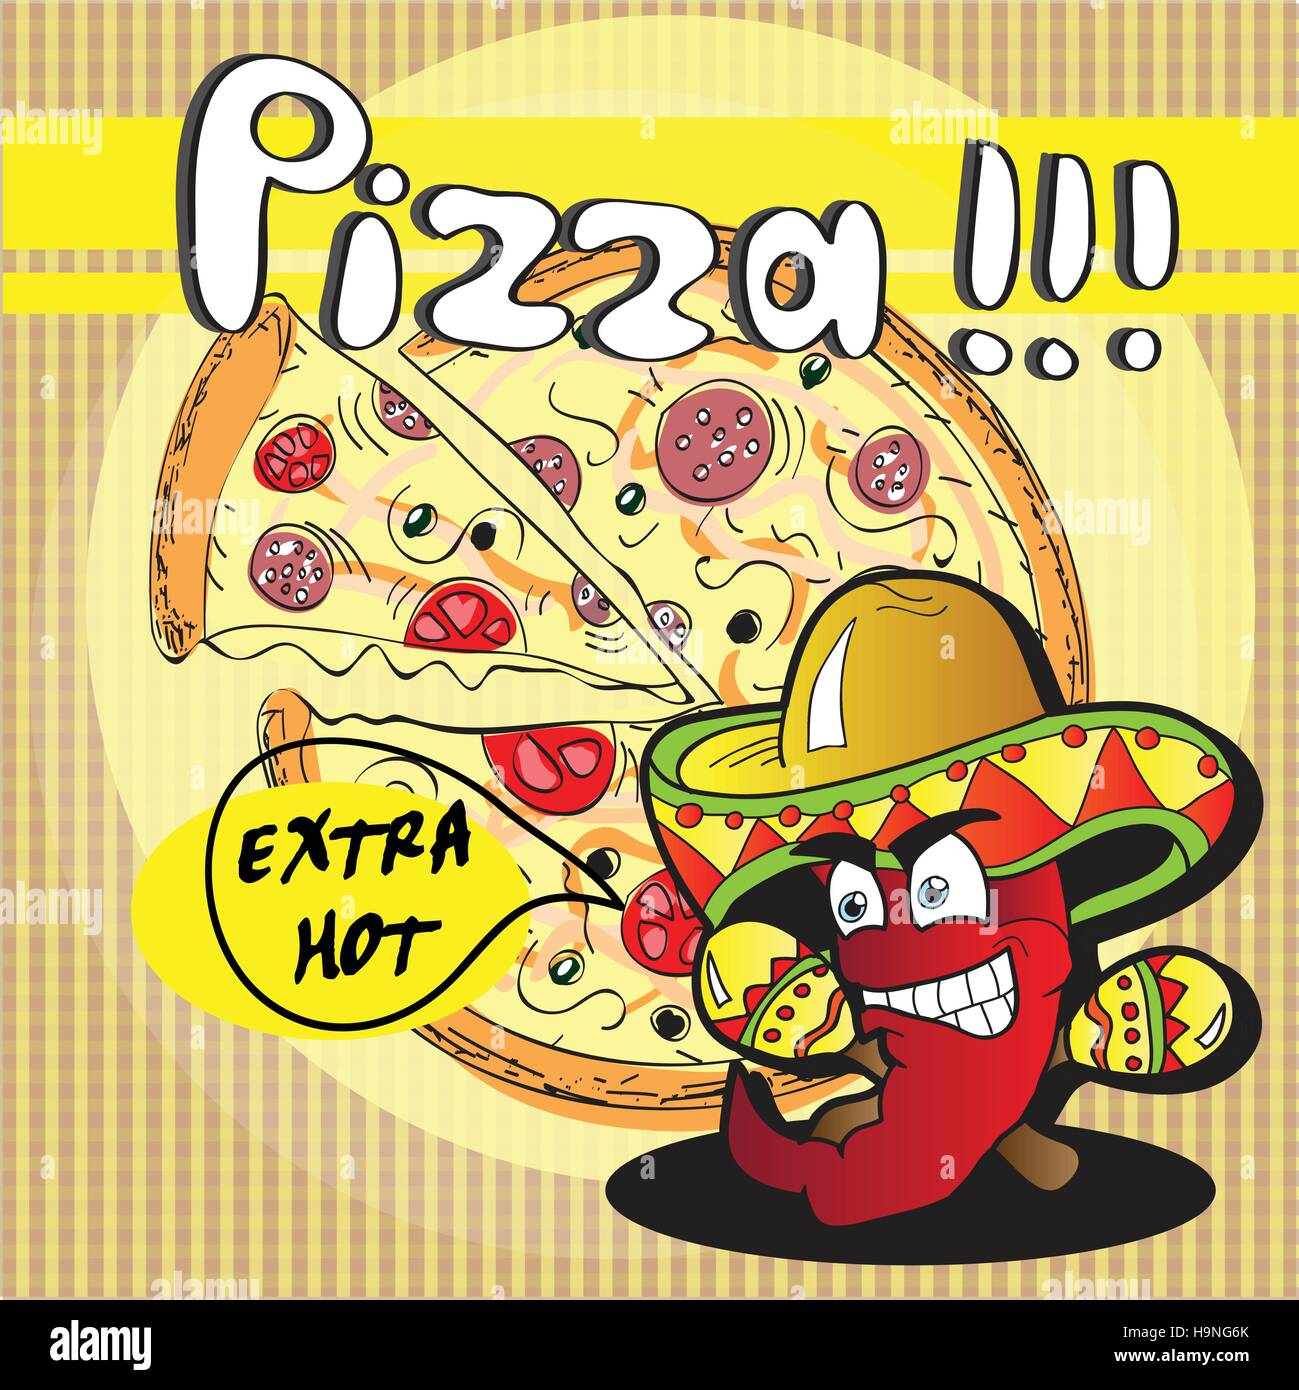 Chile-Paprika und Extra heiße Pizza - Vektor Karte Stockbild